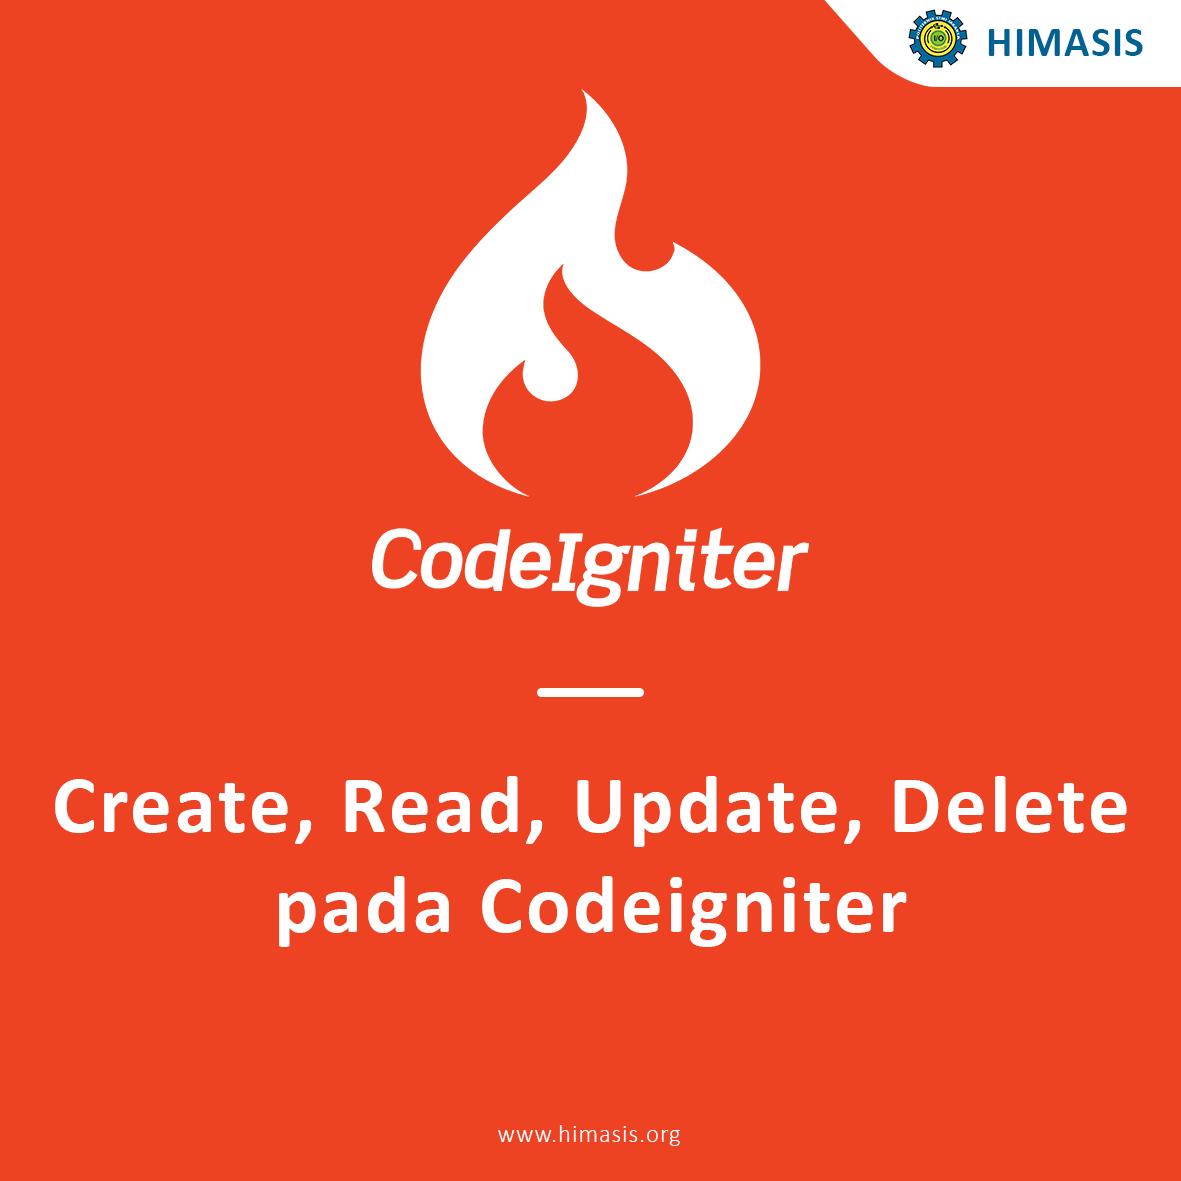 Create, Read, Update, Delete pada Codeigniter